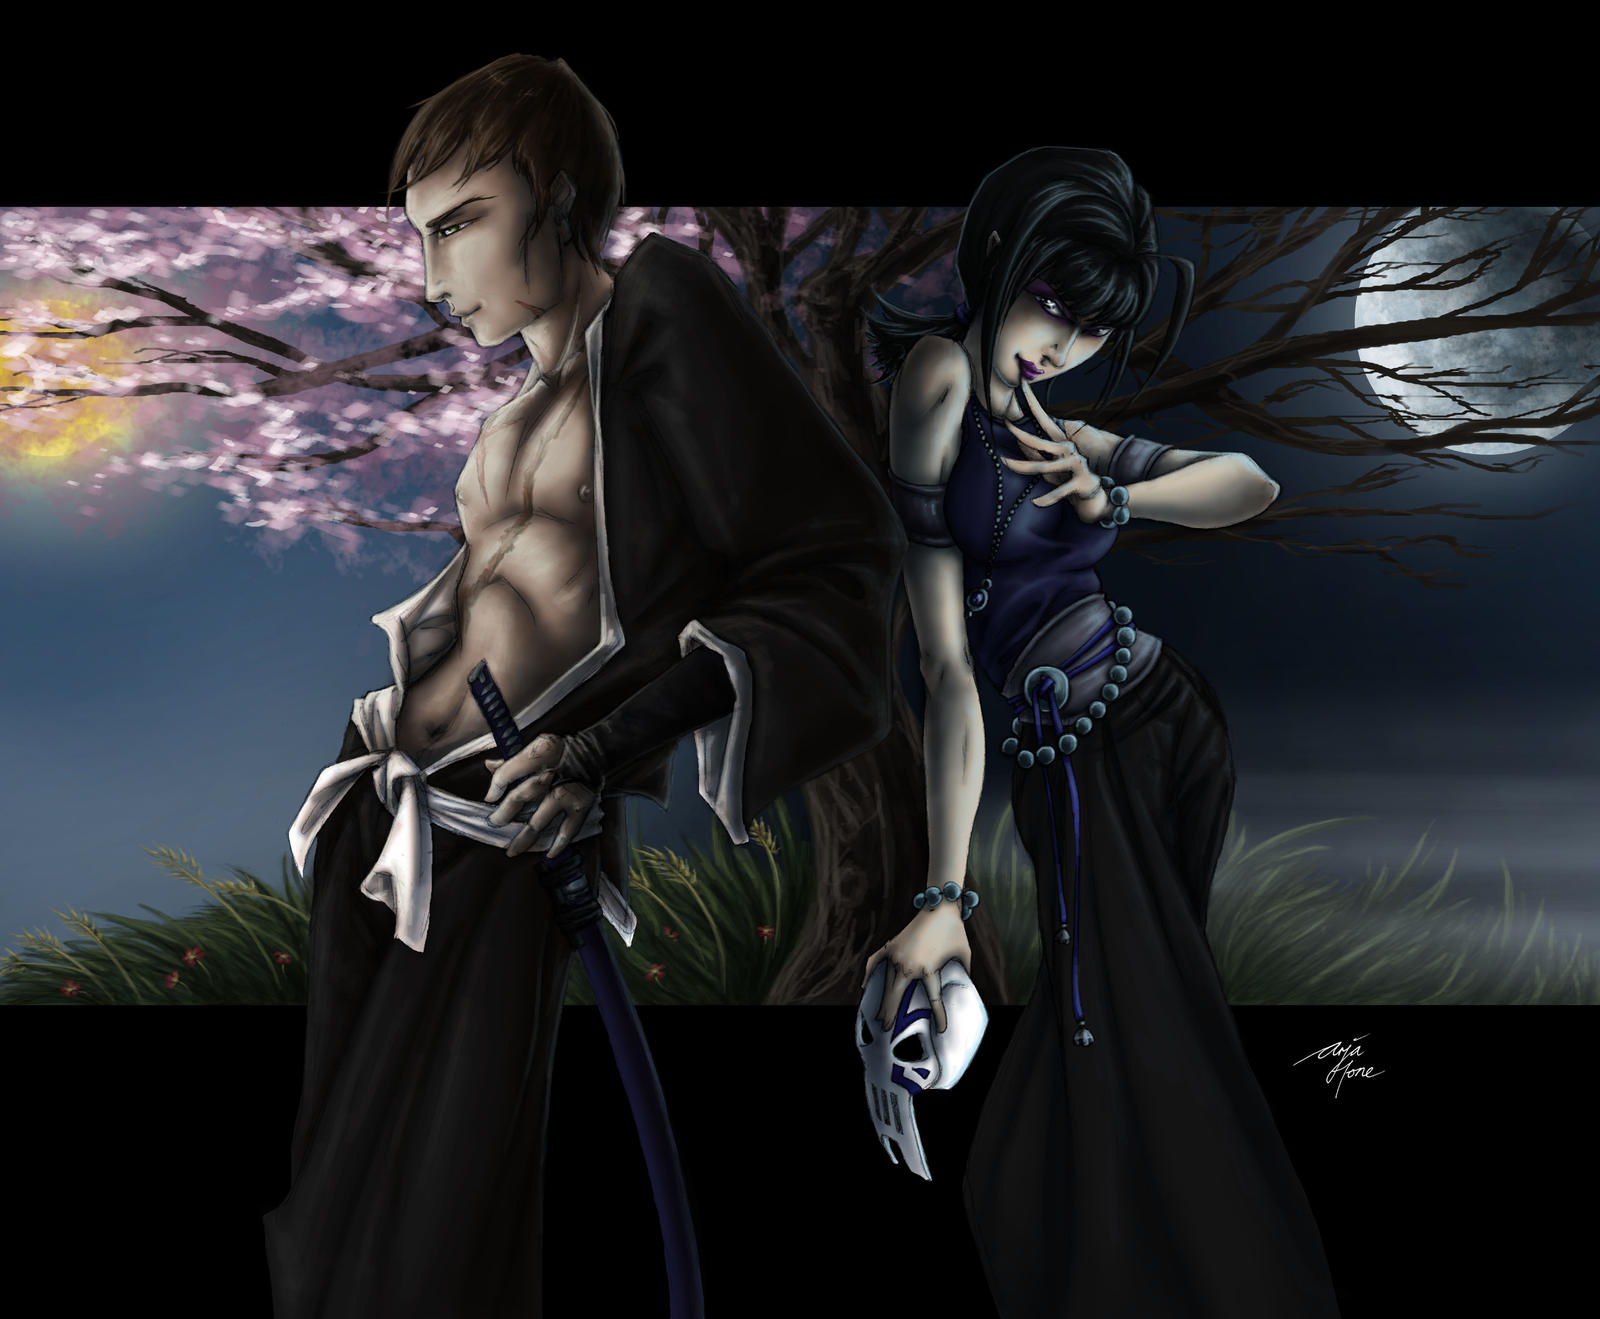 Anrak and Kage Shitsukoi by MercySW